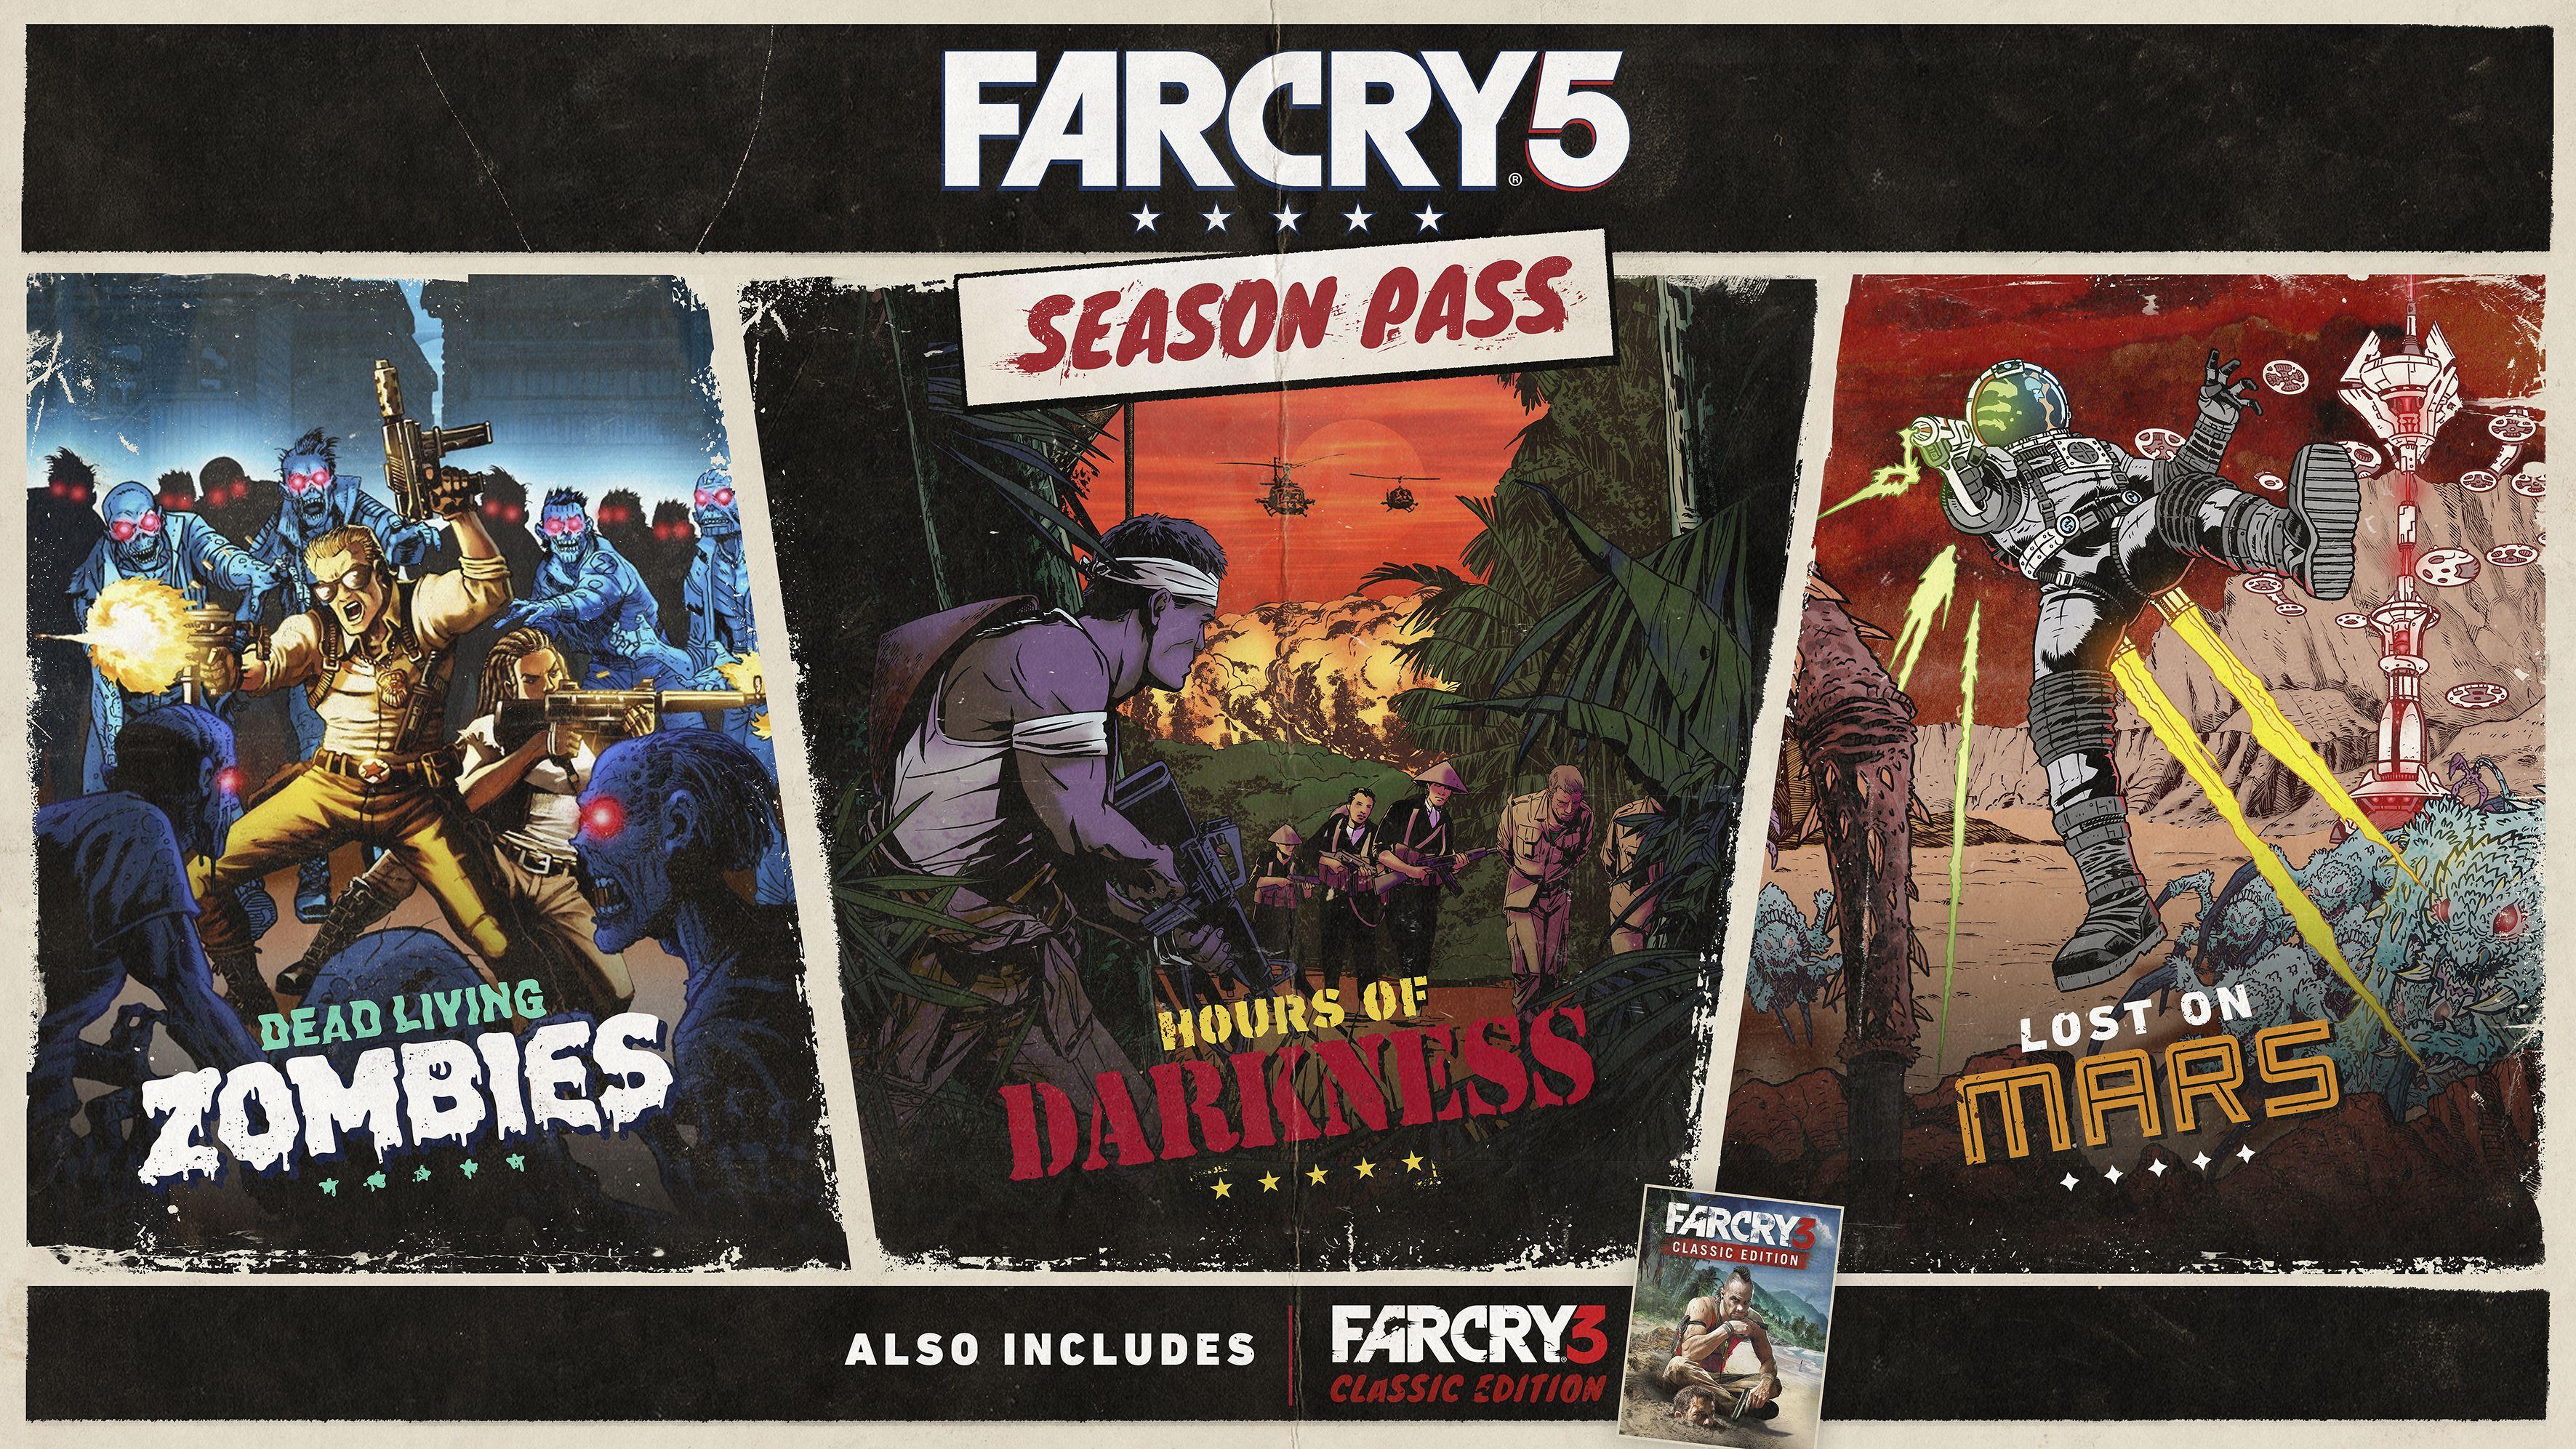 FarCry5 Season Pass